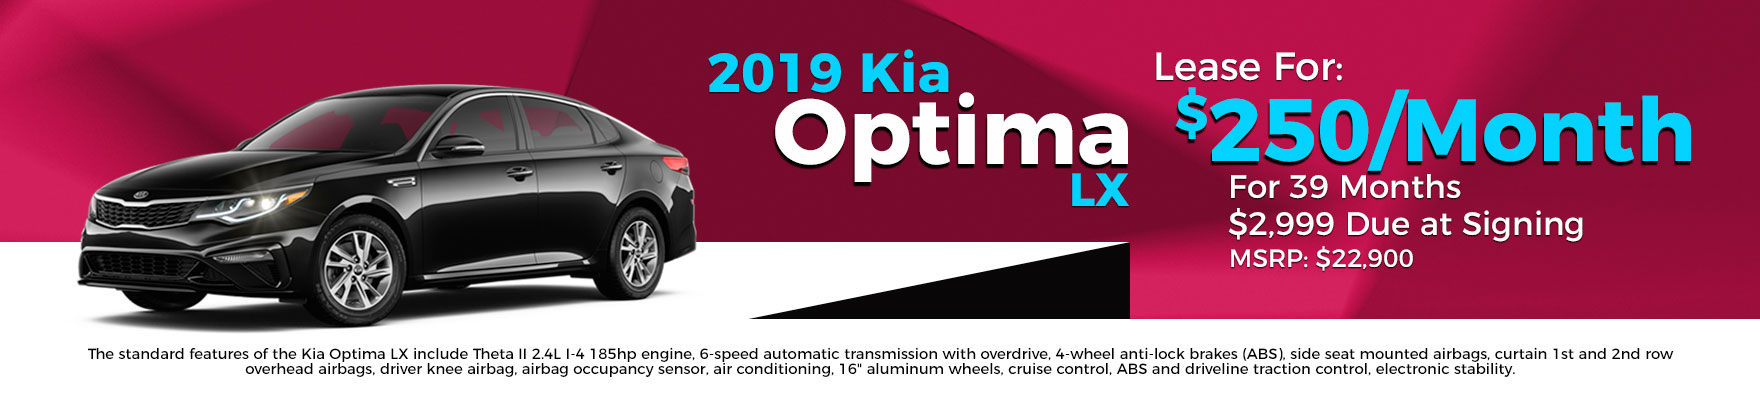 Kia Specials Template;